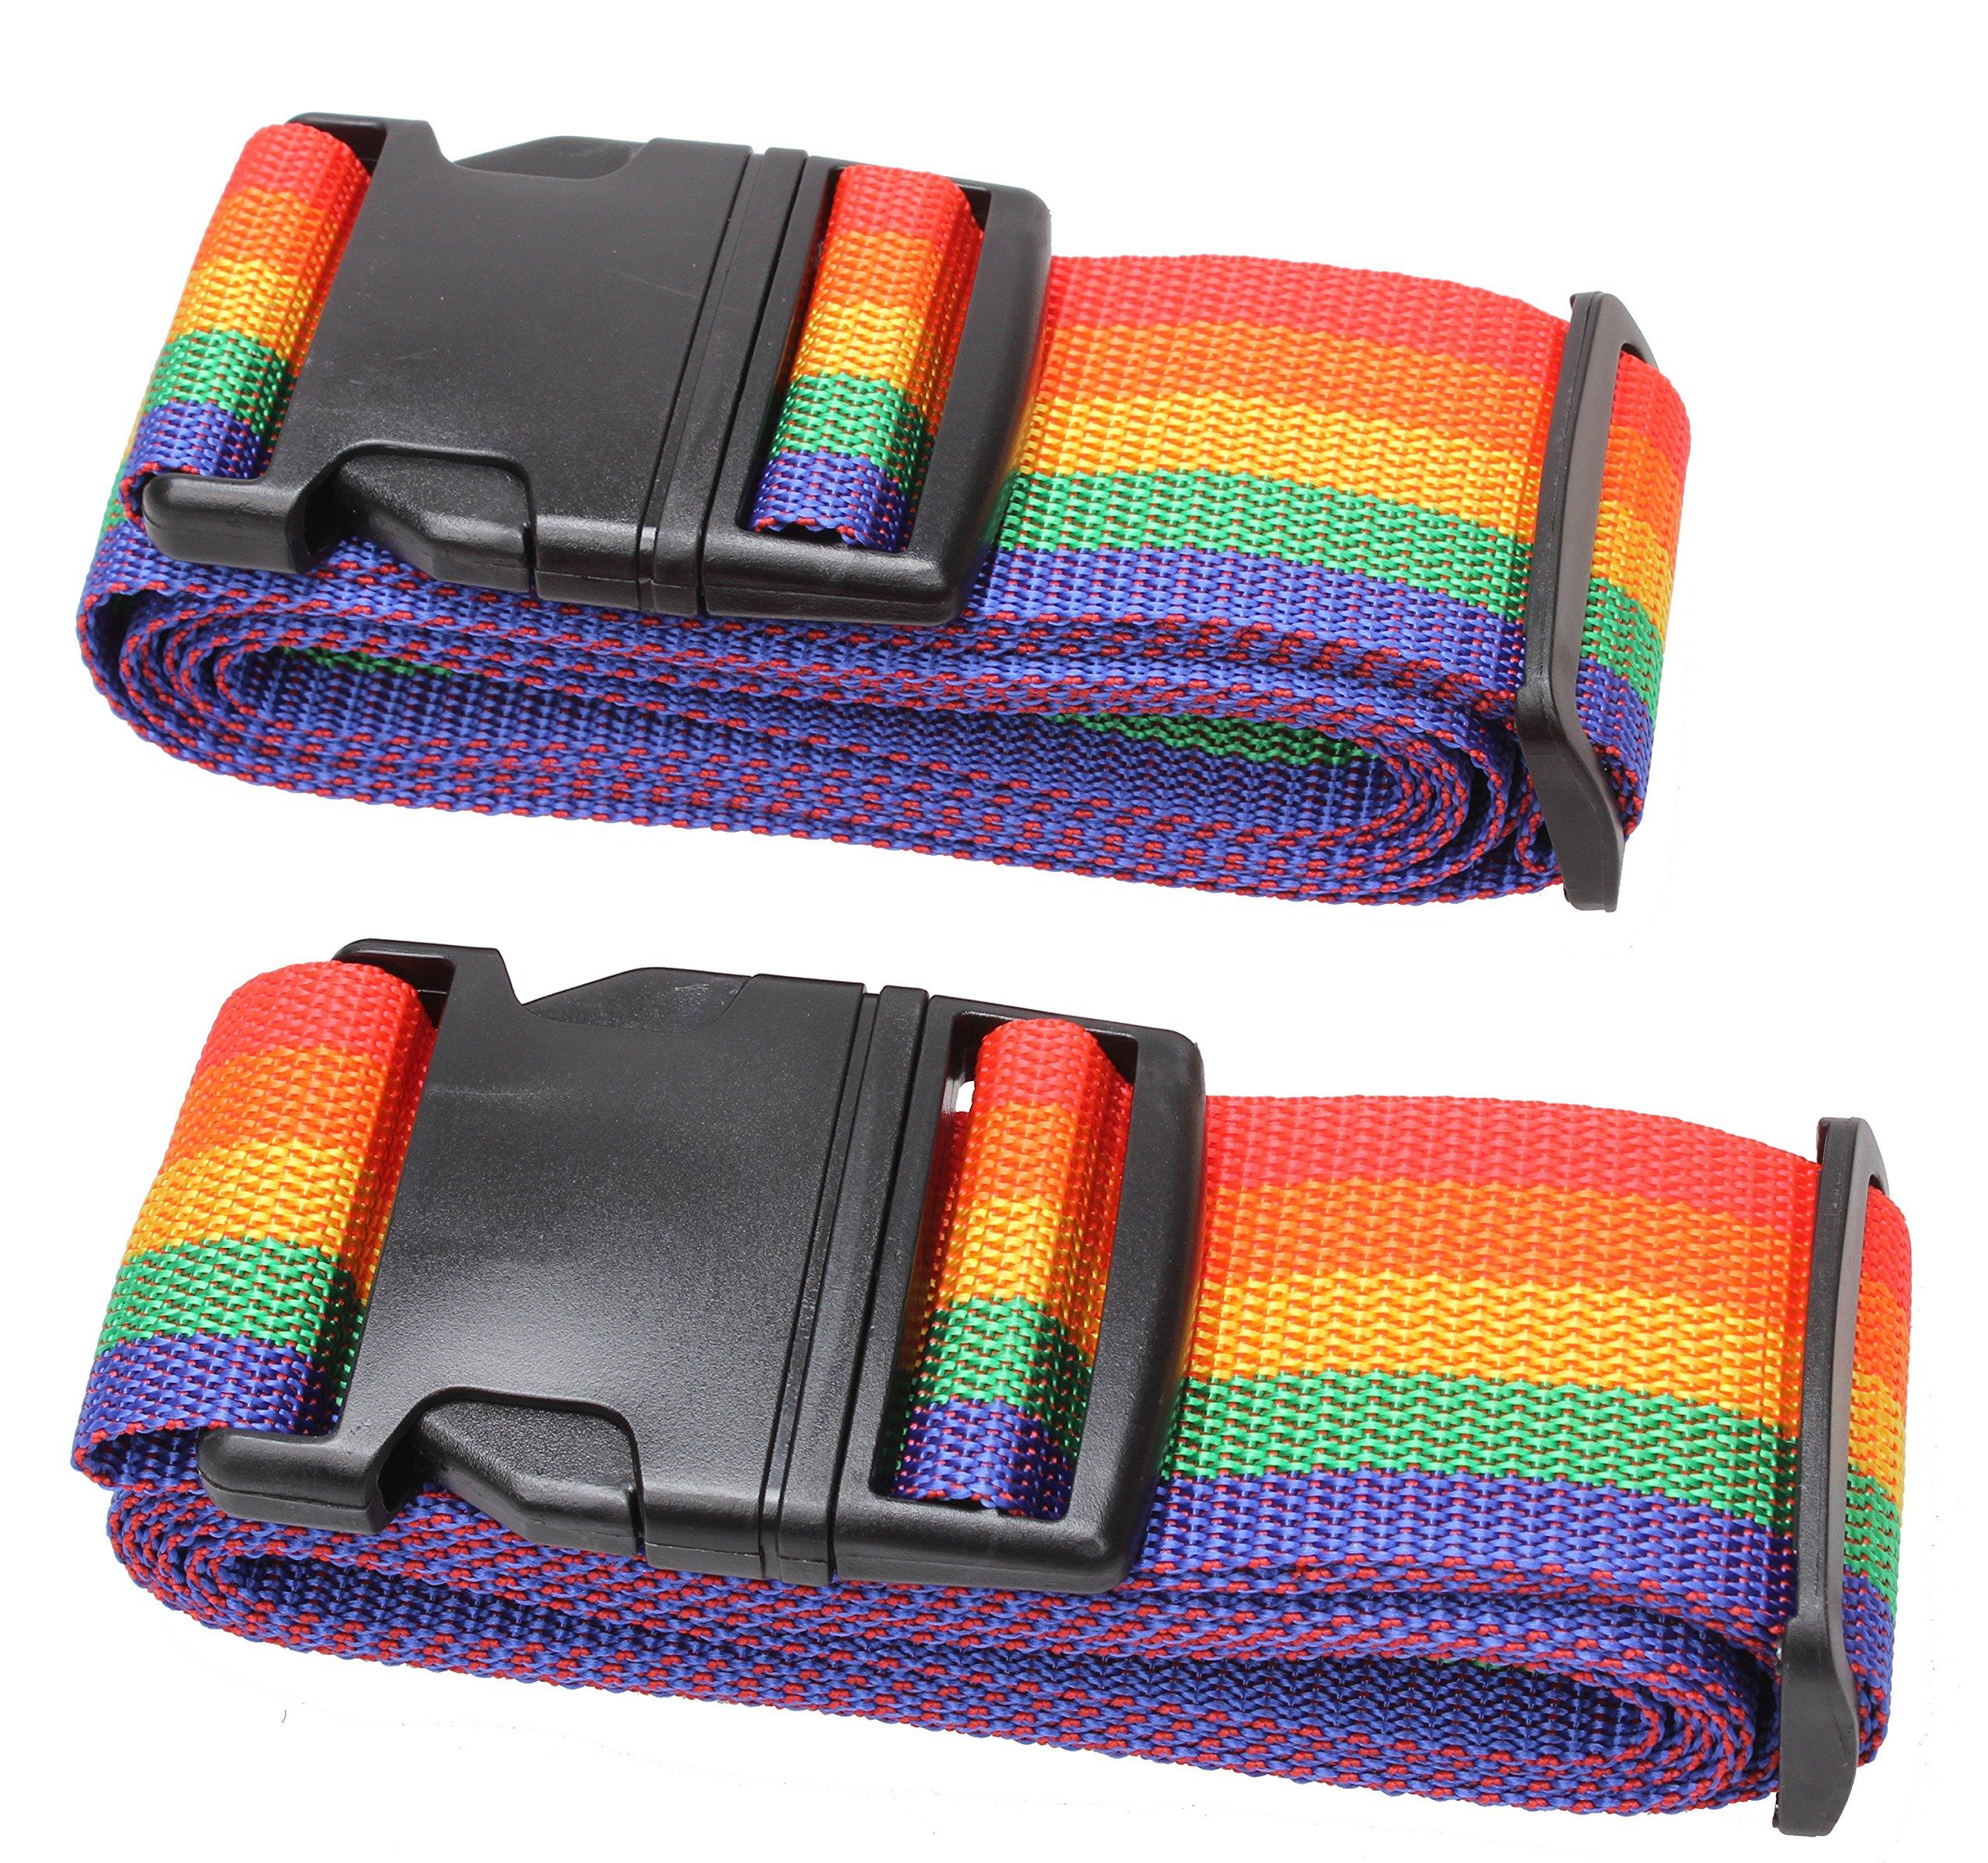 Adjustable Travel Luggage Strap Suitcase Security Belt Straps #L18B (2Multi01)